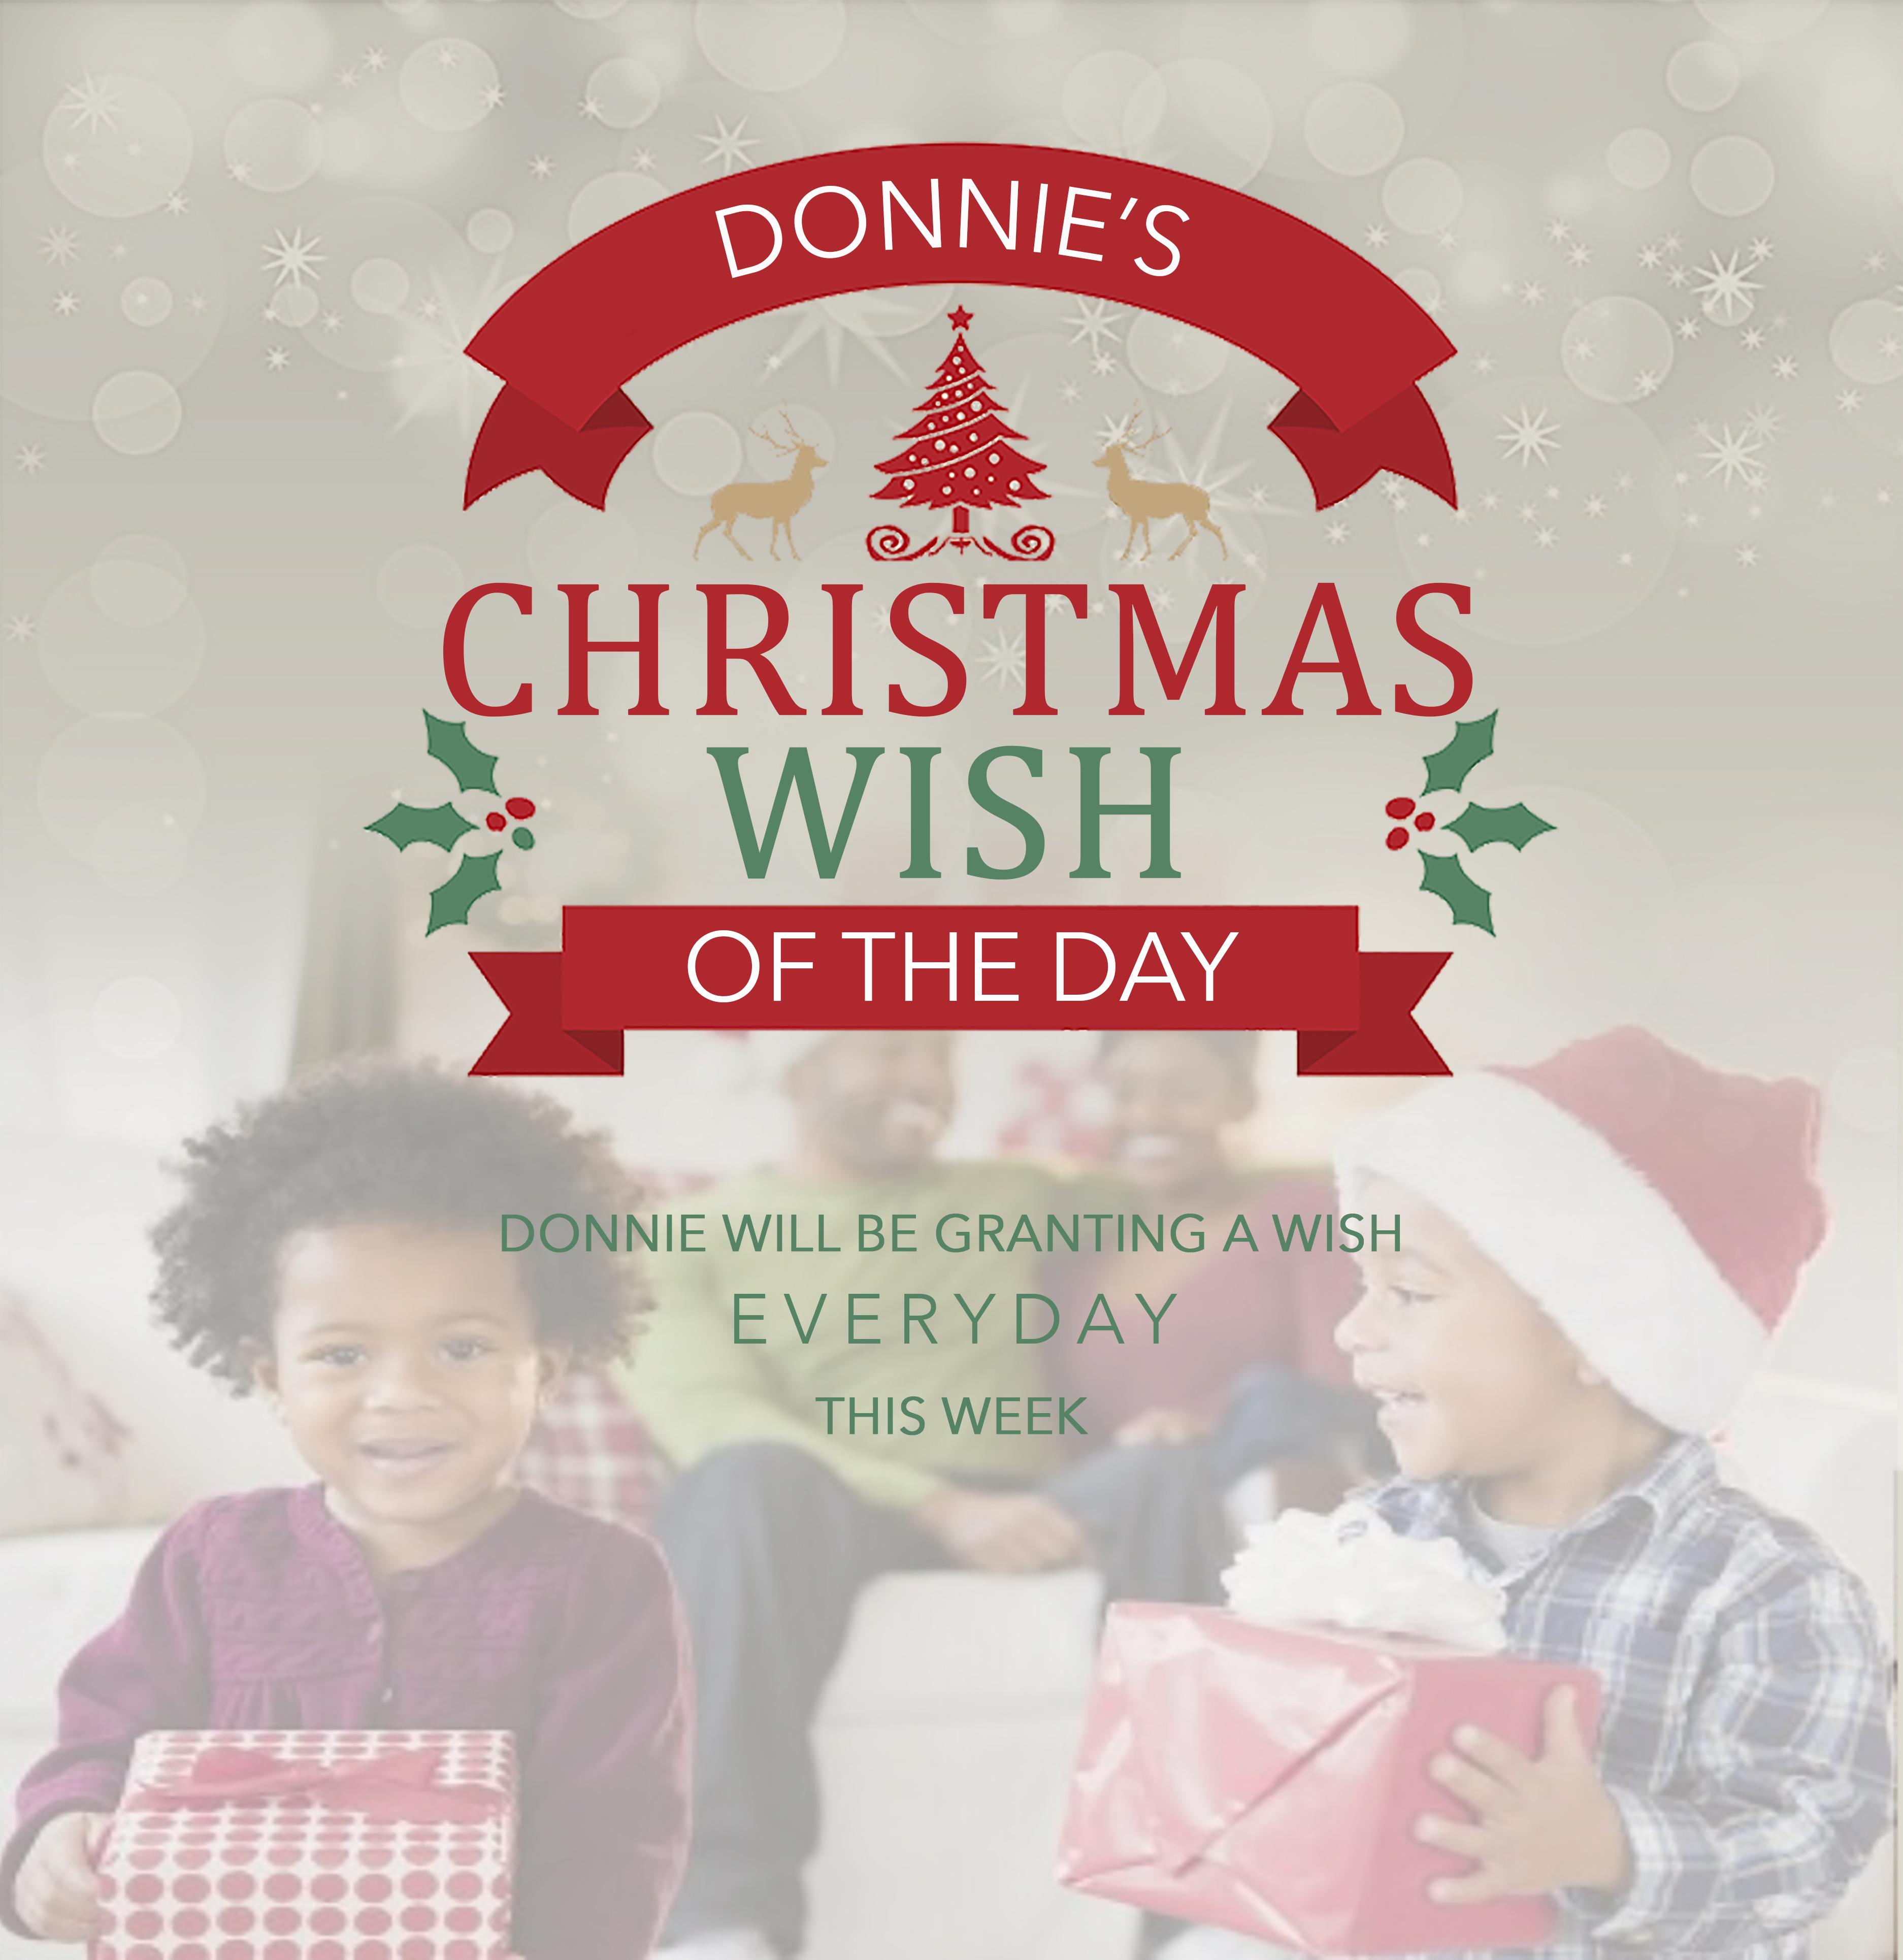 Donnie's Christmas Wish